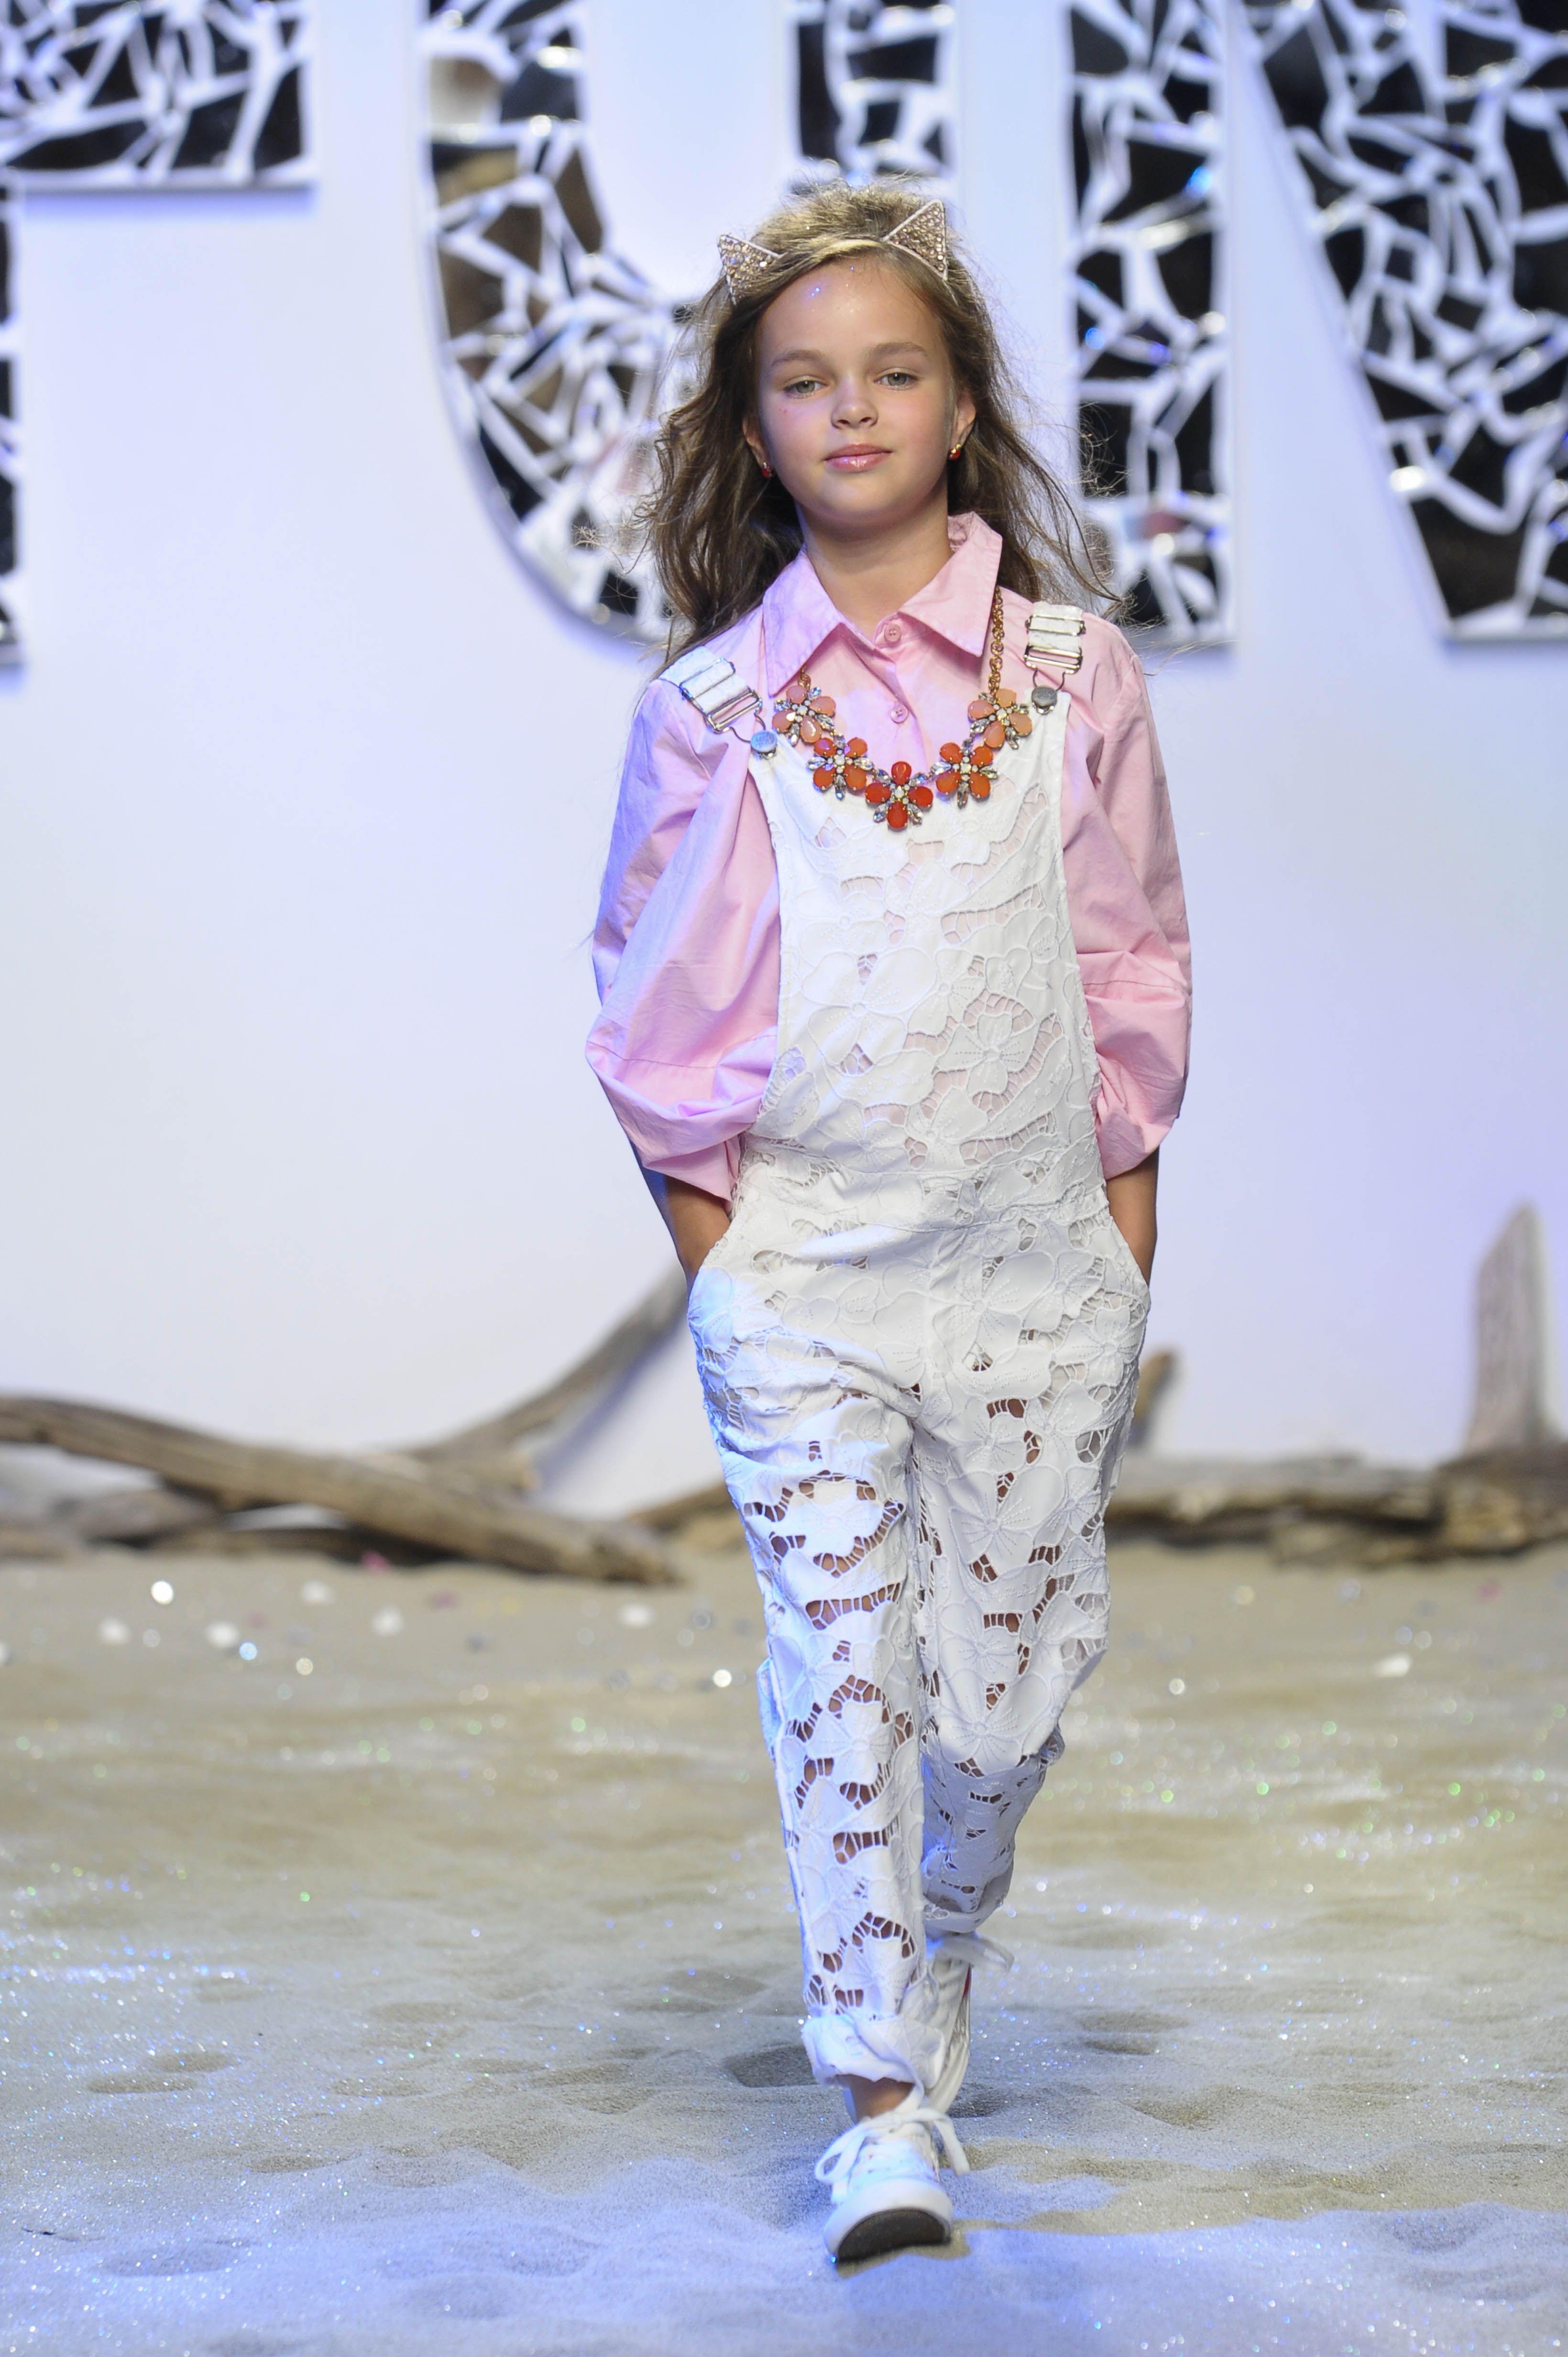 Lace kids jumpsuit by Fun \u0026 Fun at Pitti Bimbo for spring/summer 2016  kidswear